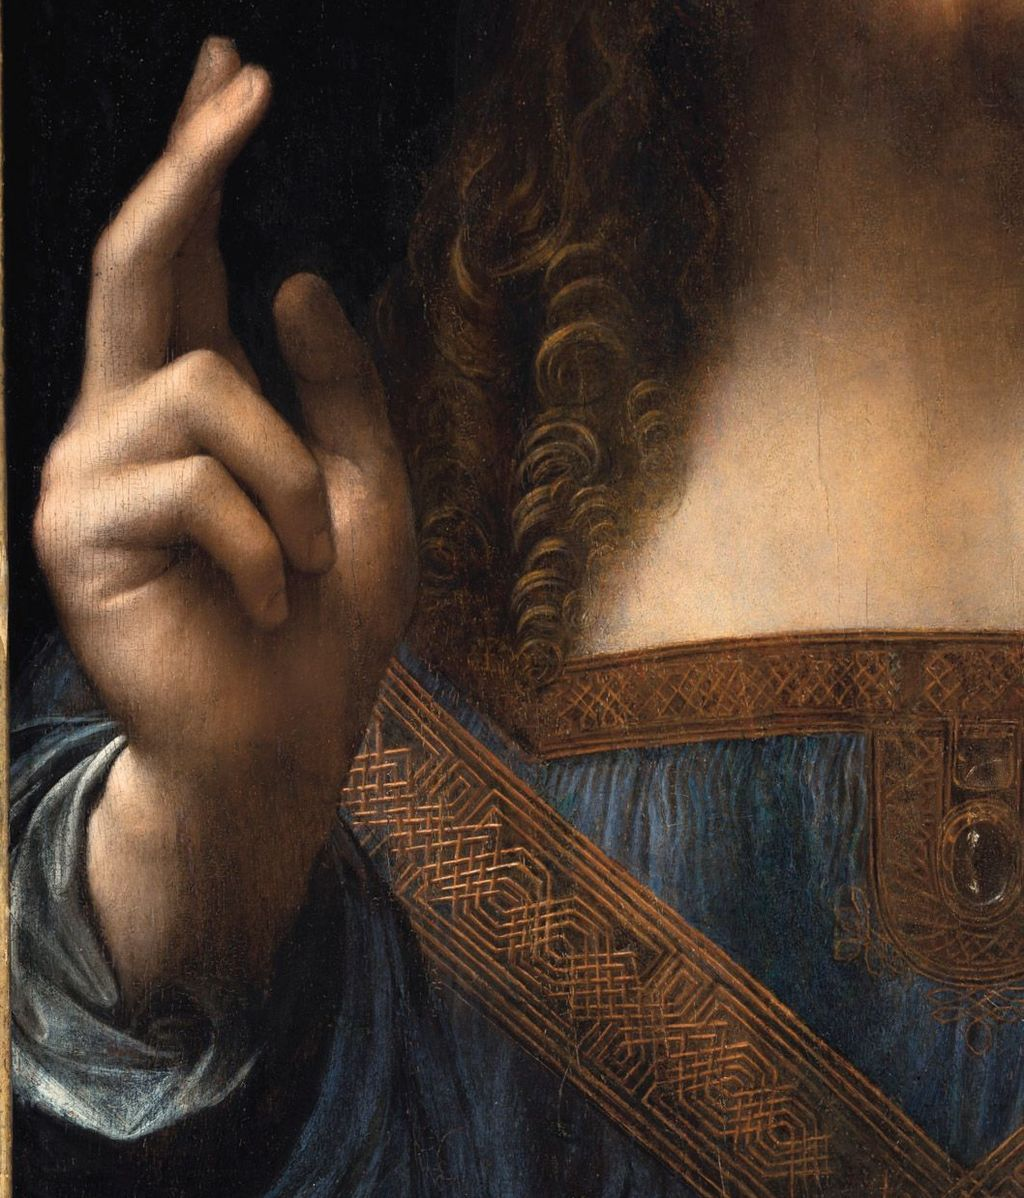 Detalles de la mano del 'Salvator Mundi'